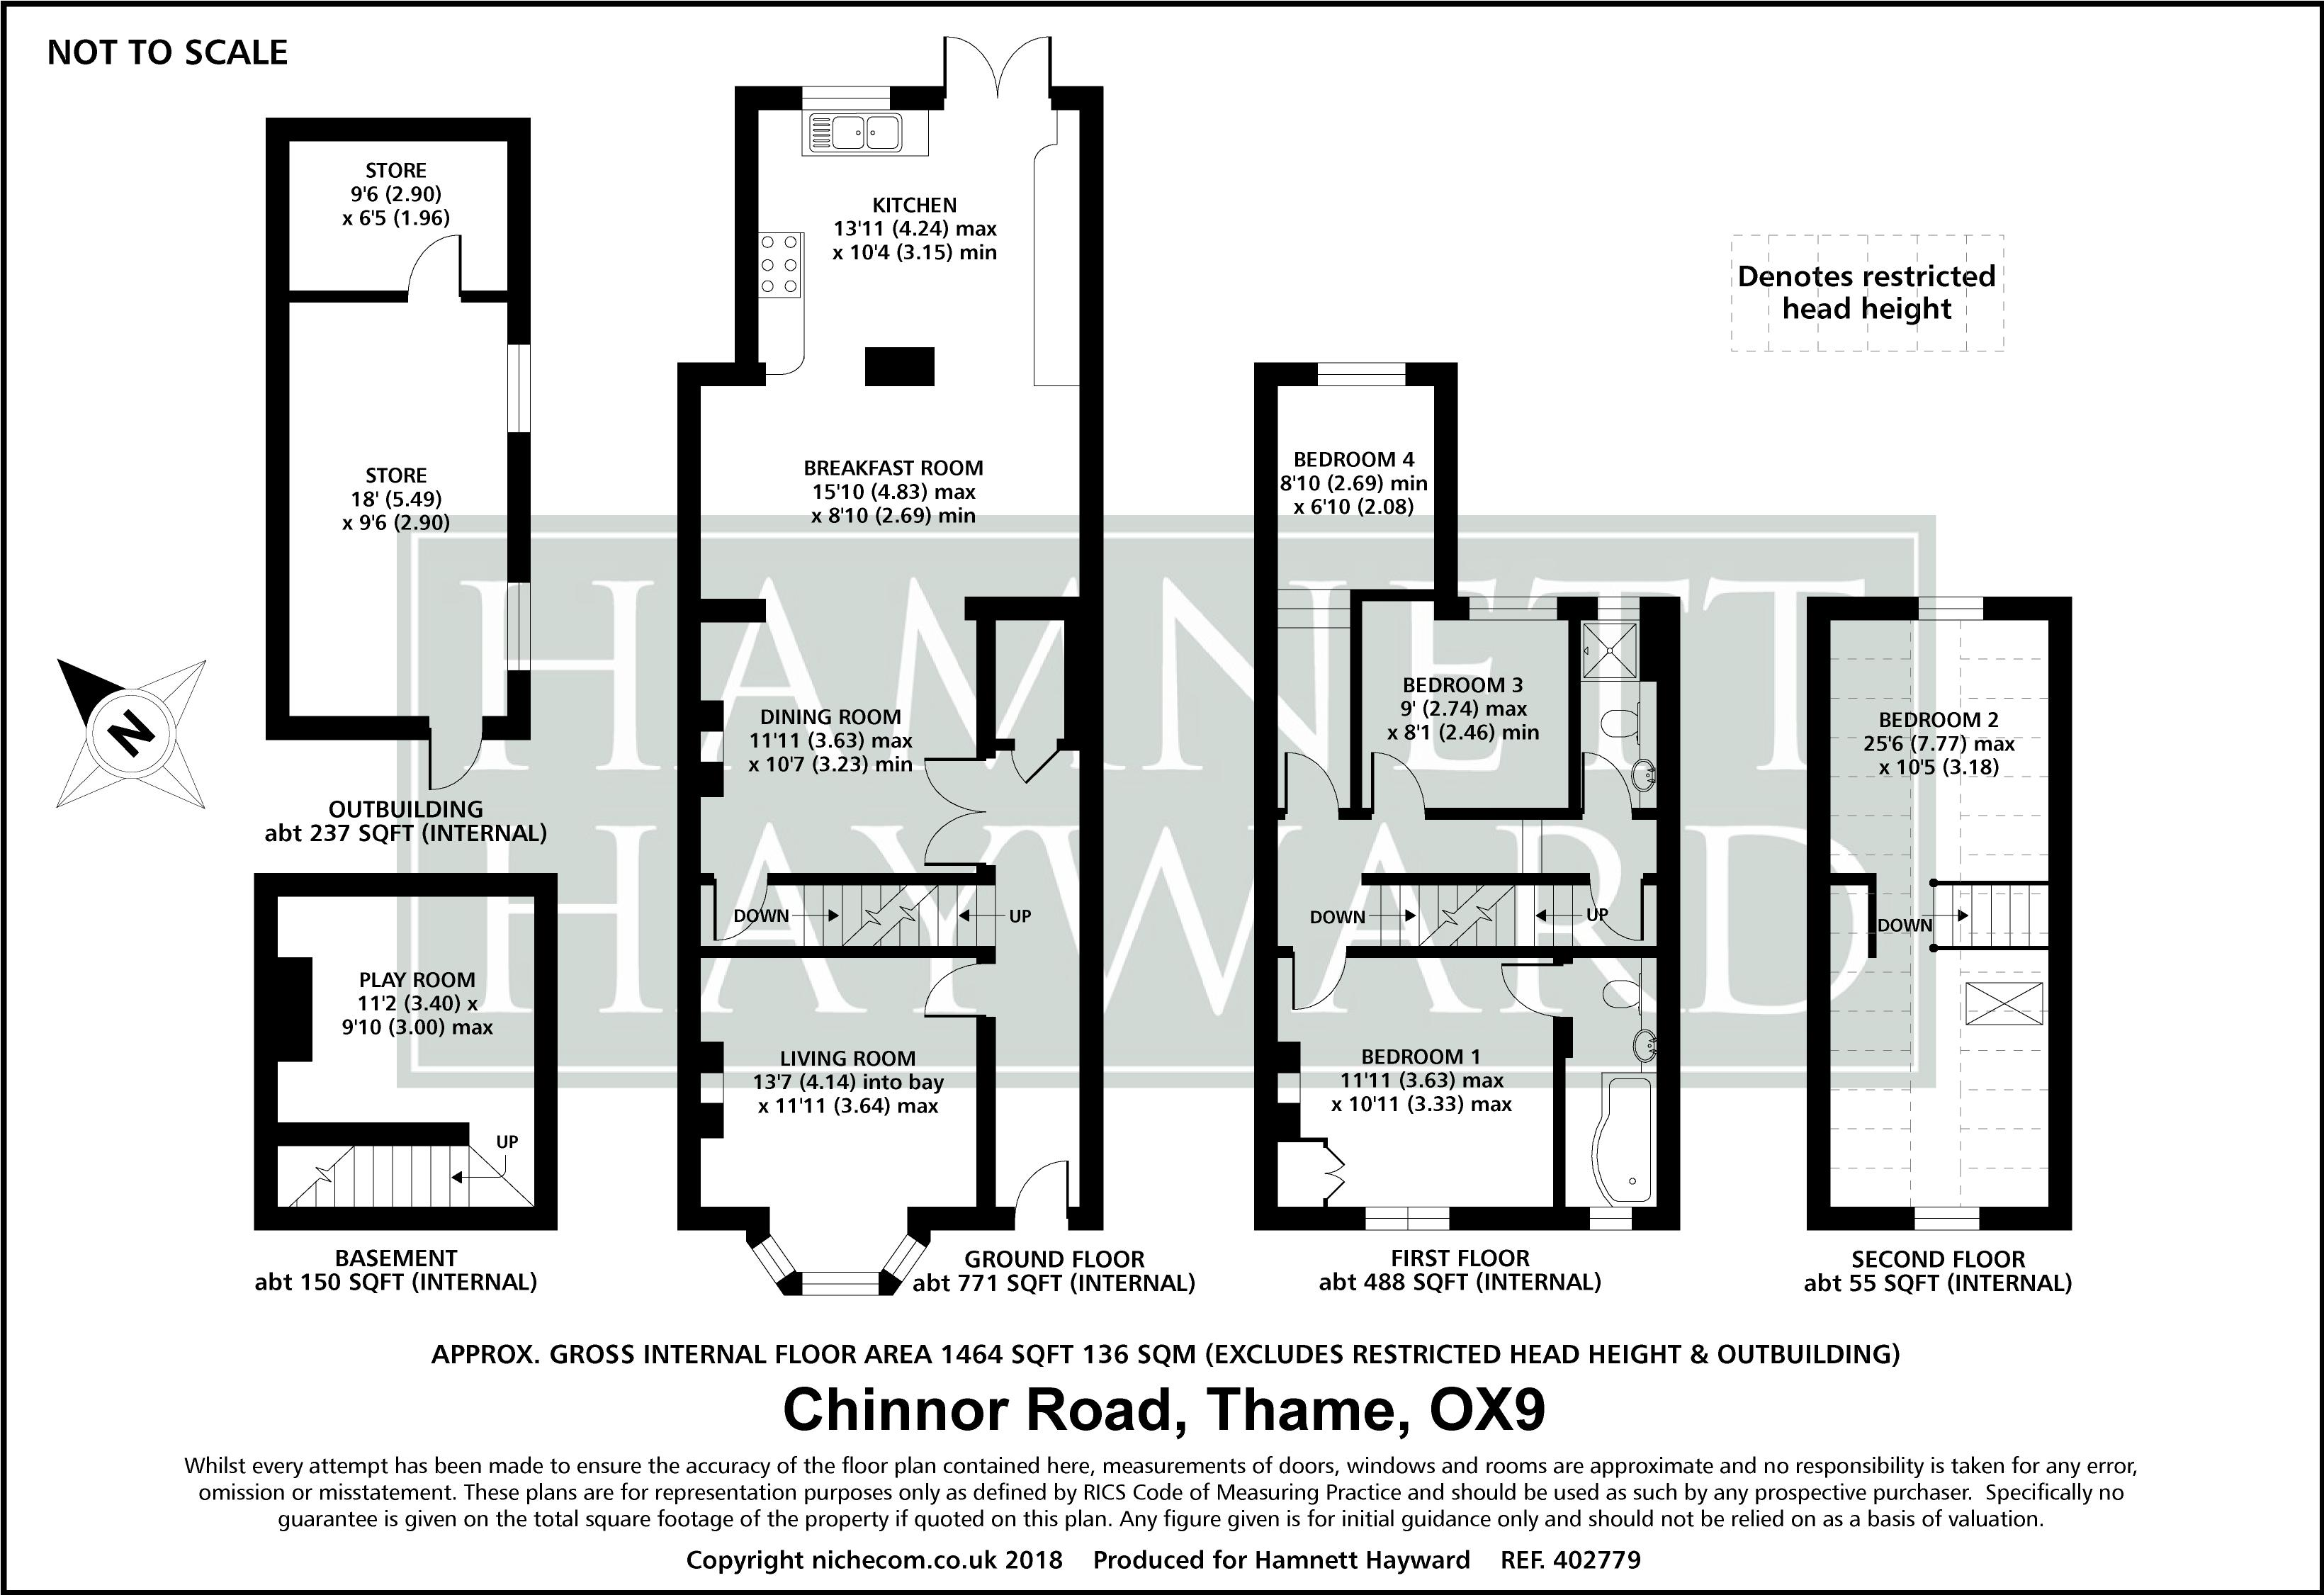 Chinnor Road